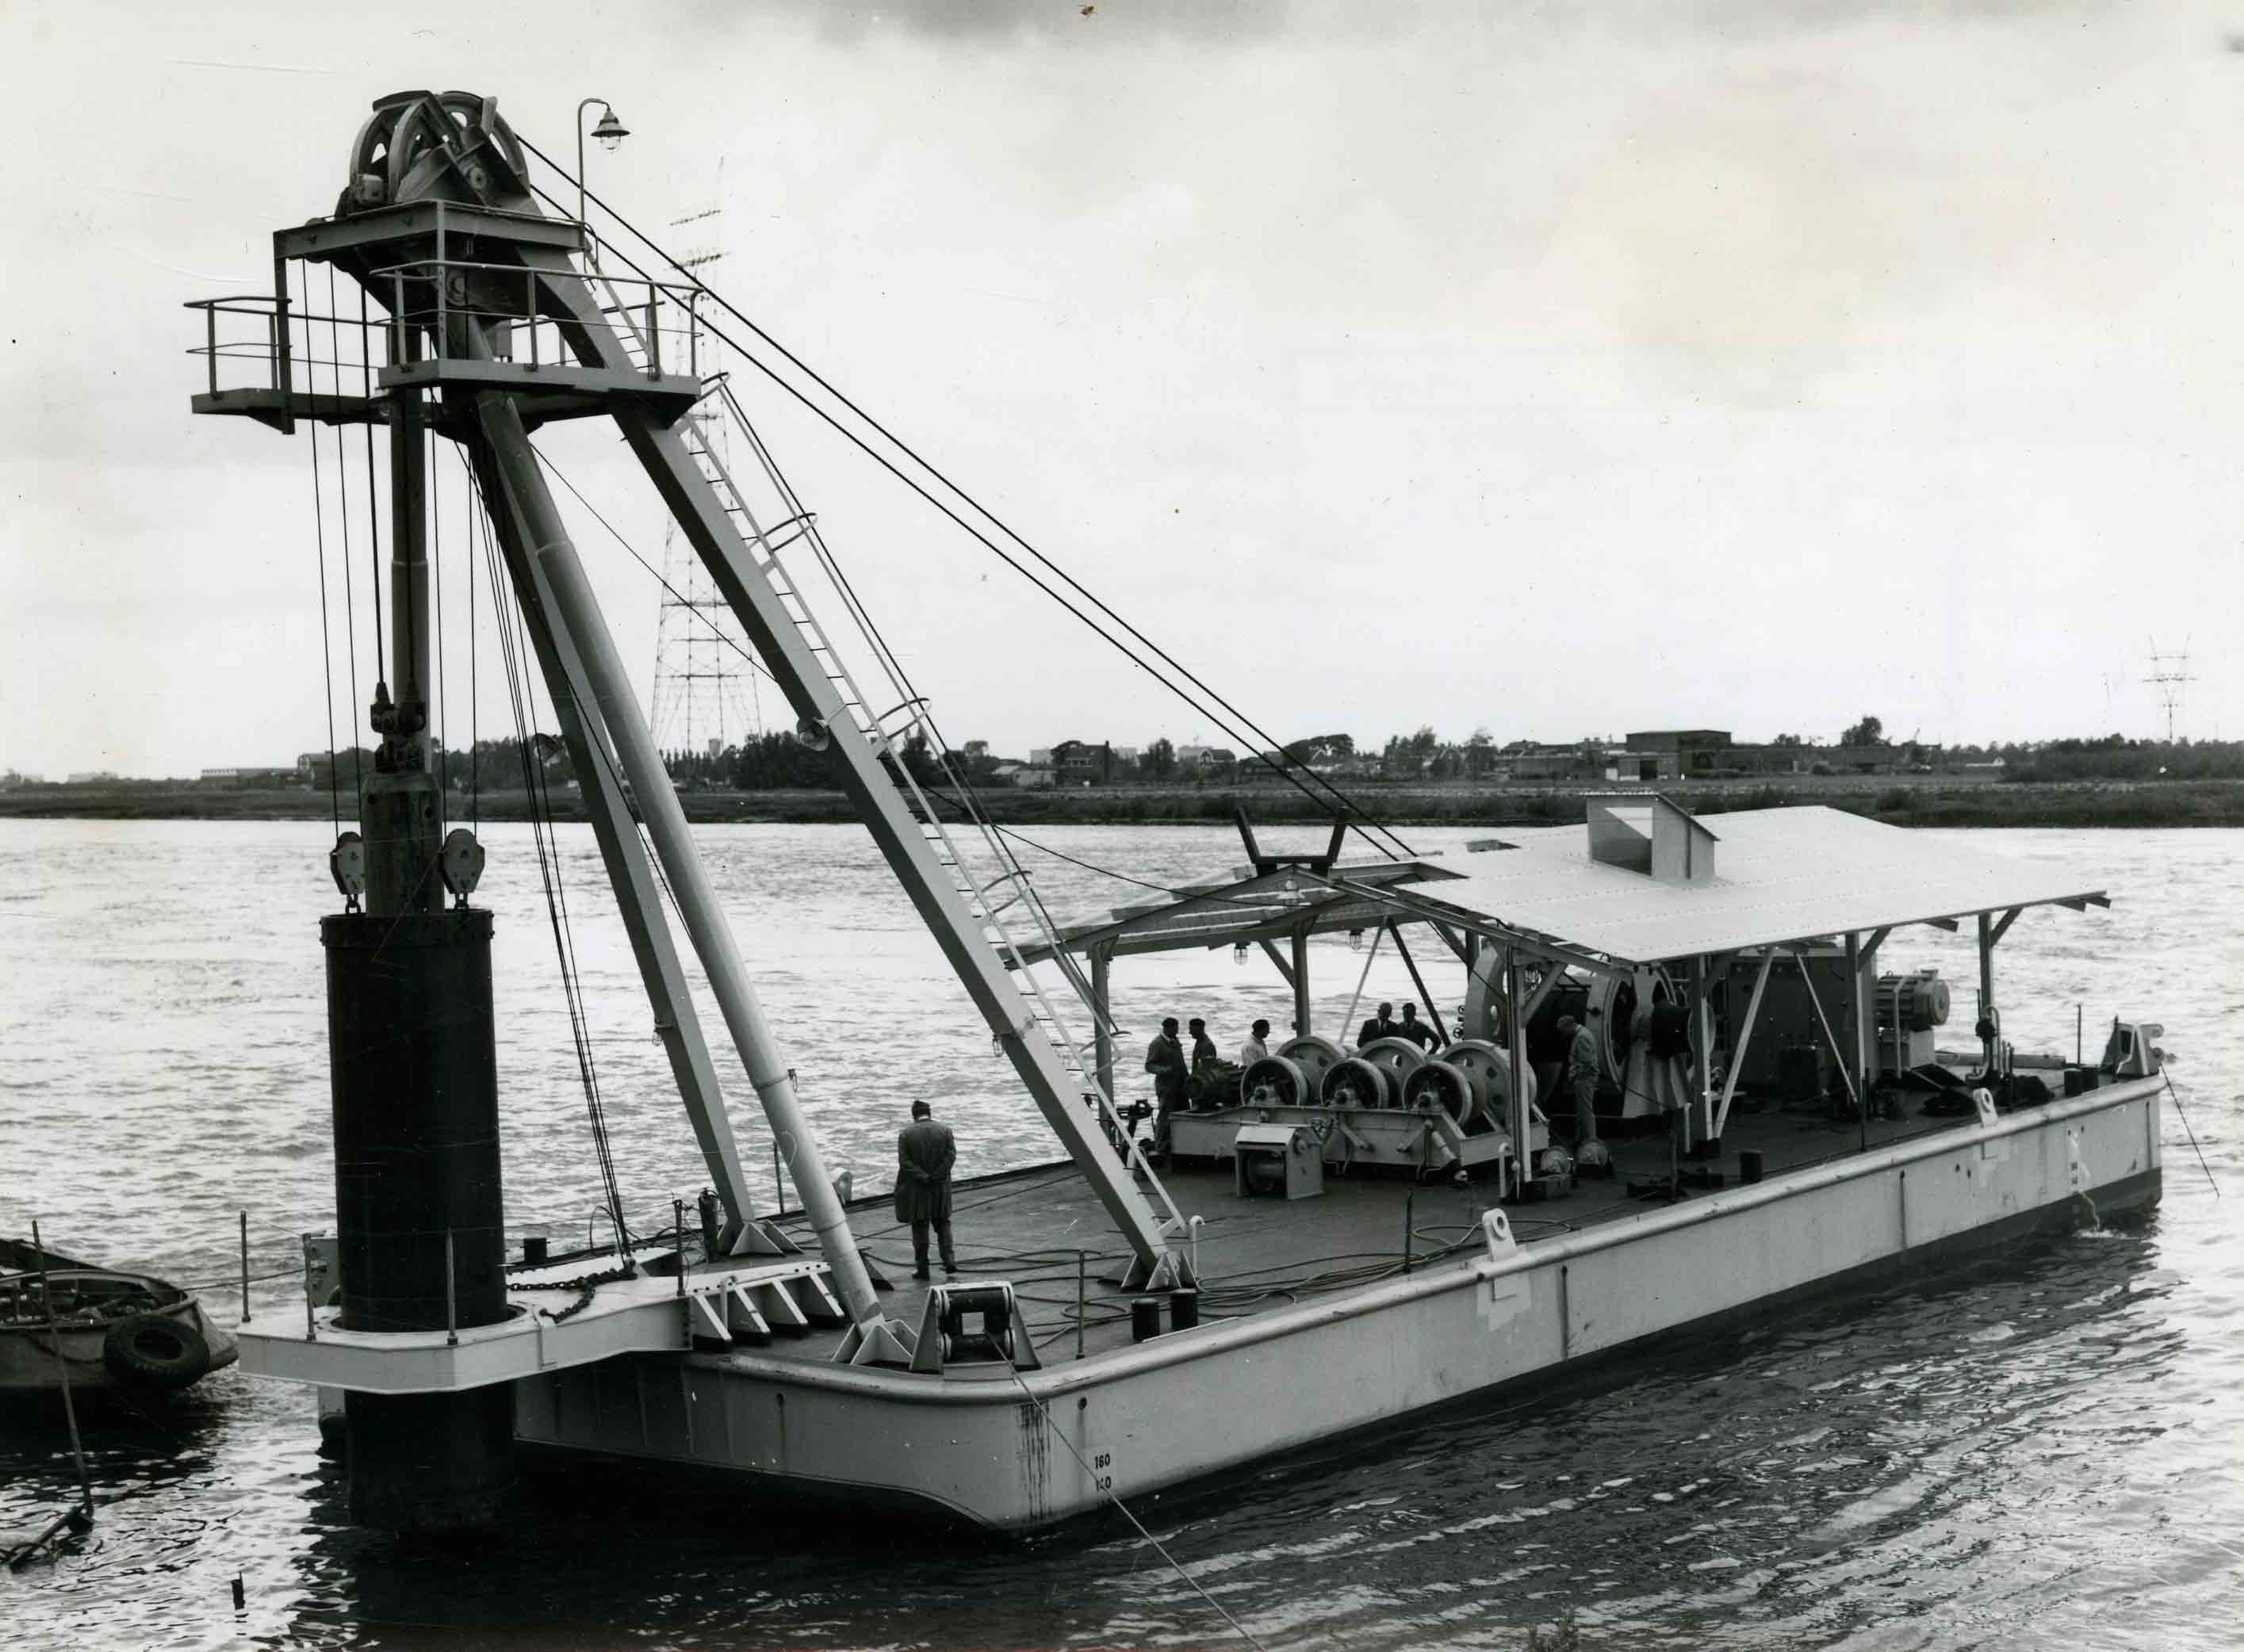 Bnr. 349: Alfil (1967) (Co. 577